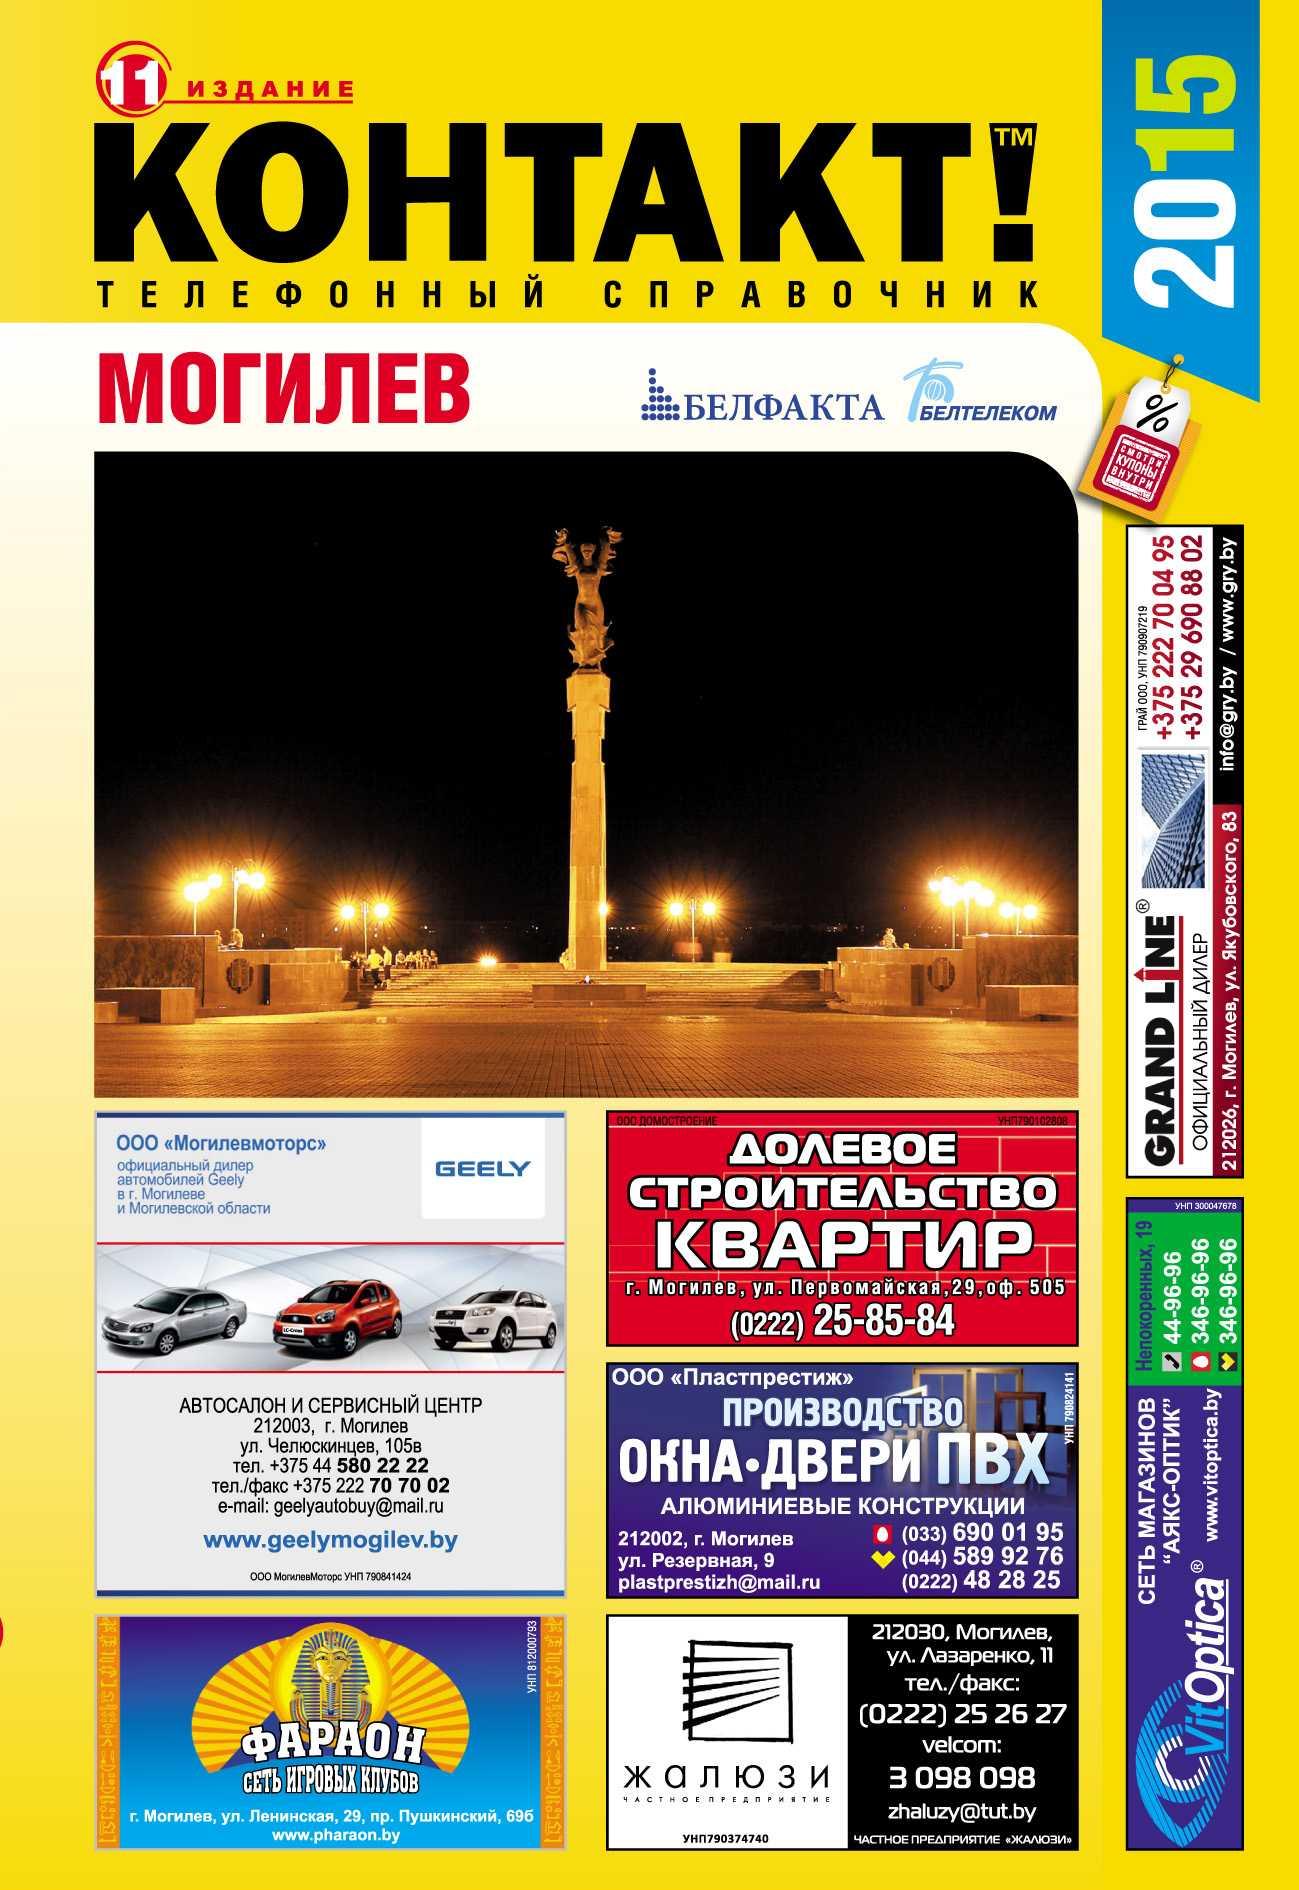 справочник телефонов velcom беларуси